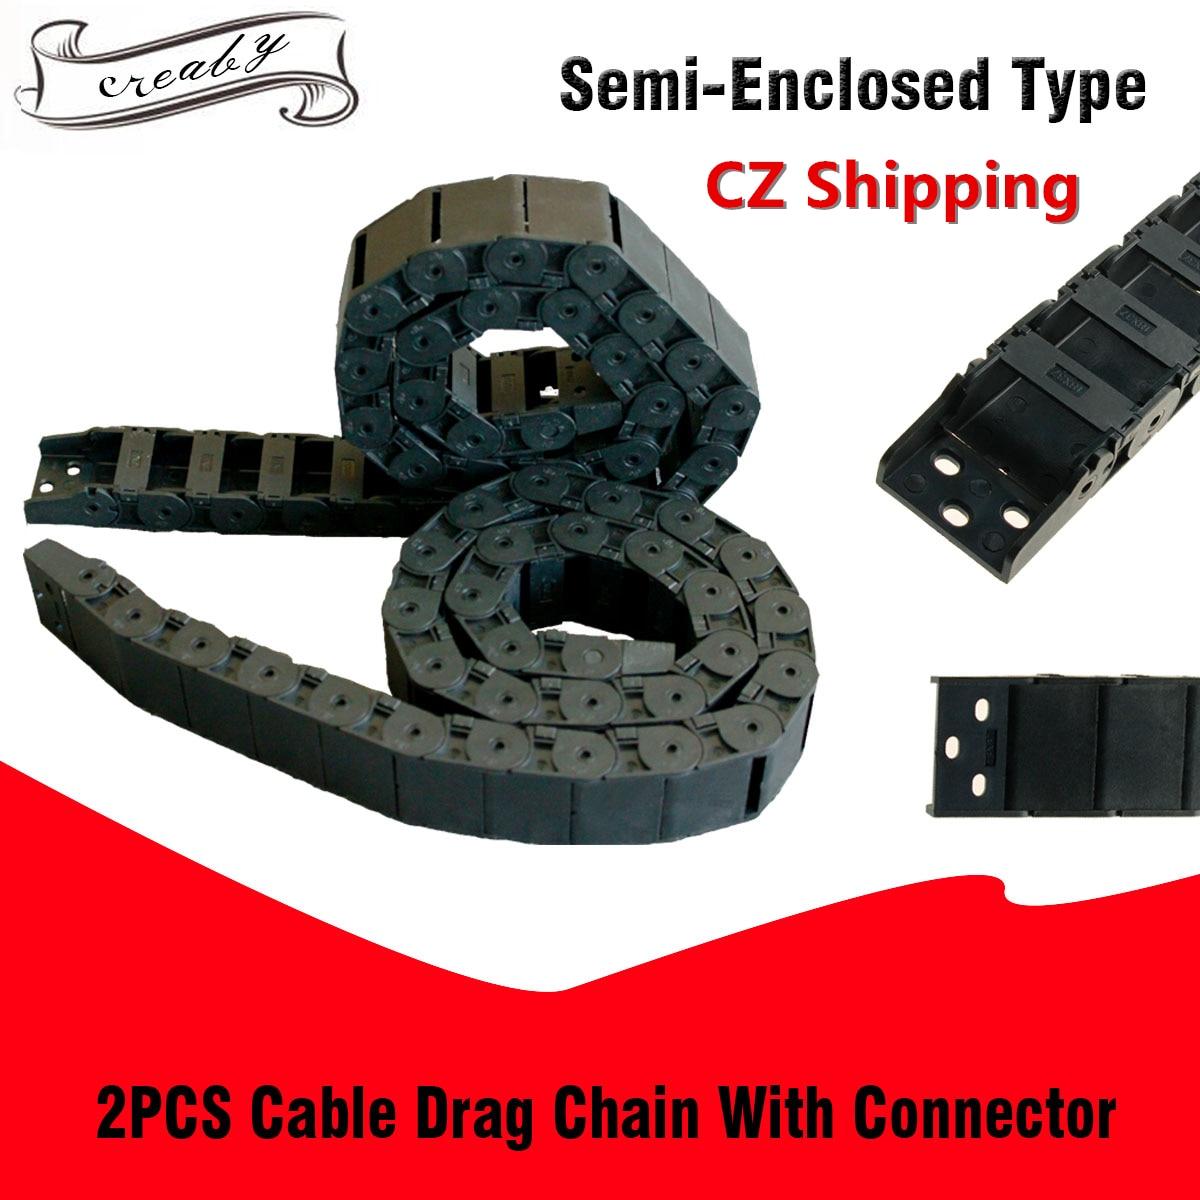 18x37mm 18x50mm R38 longitud 1M Cable plástico Semi cerrado cadena de arrastre portador de alambre para impresora 3D CNC maquina enrutadora 2 uds